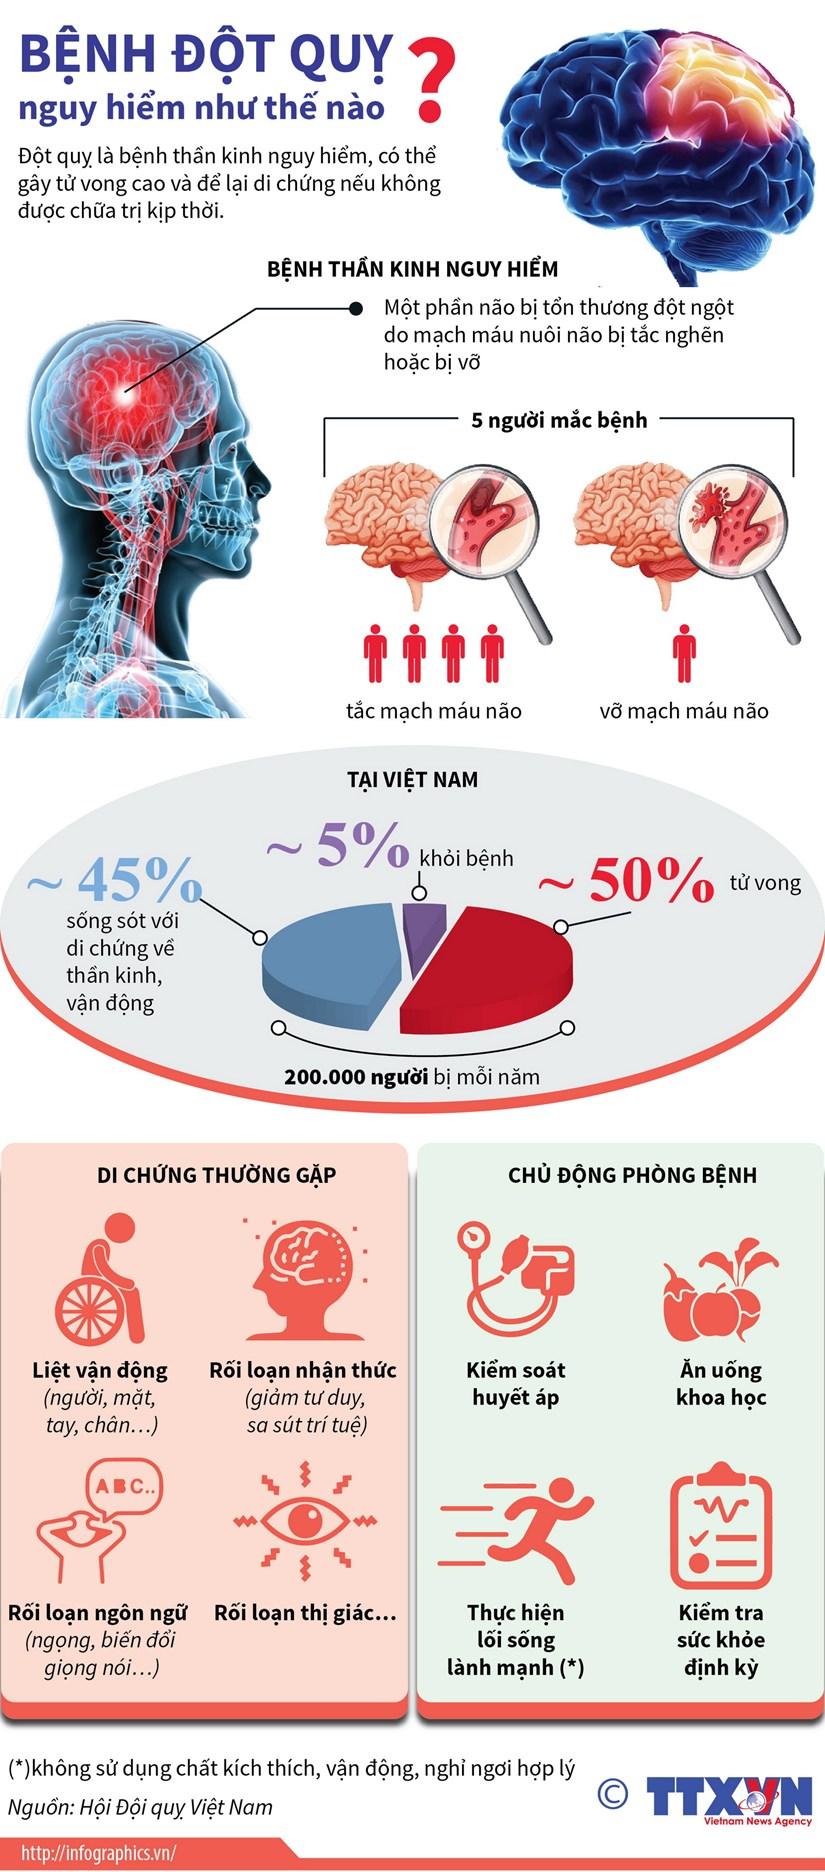 [Infographics] Benh dot quy nguy hiem nhu the nao? hinh anh 1